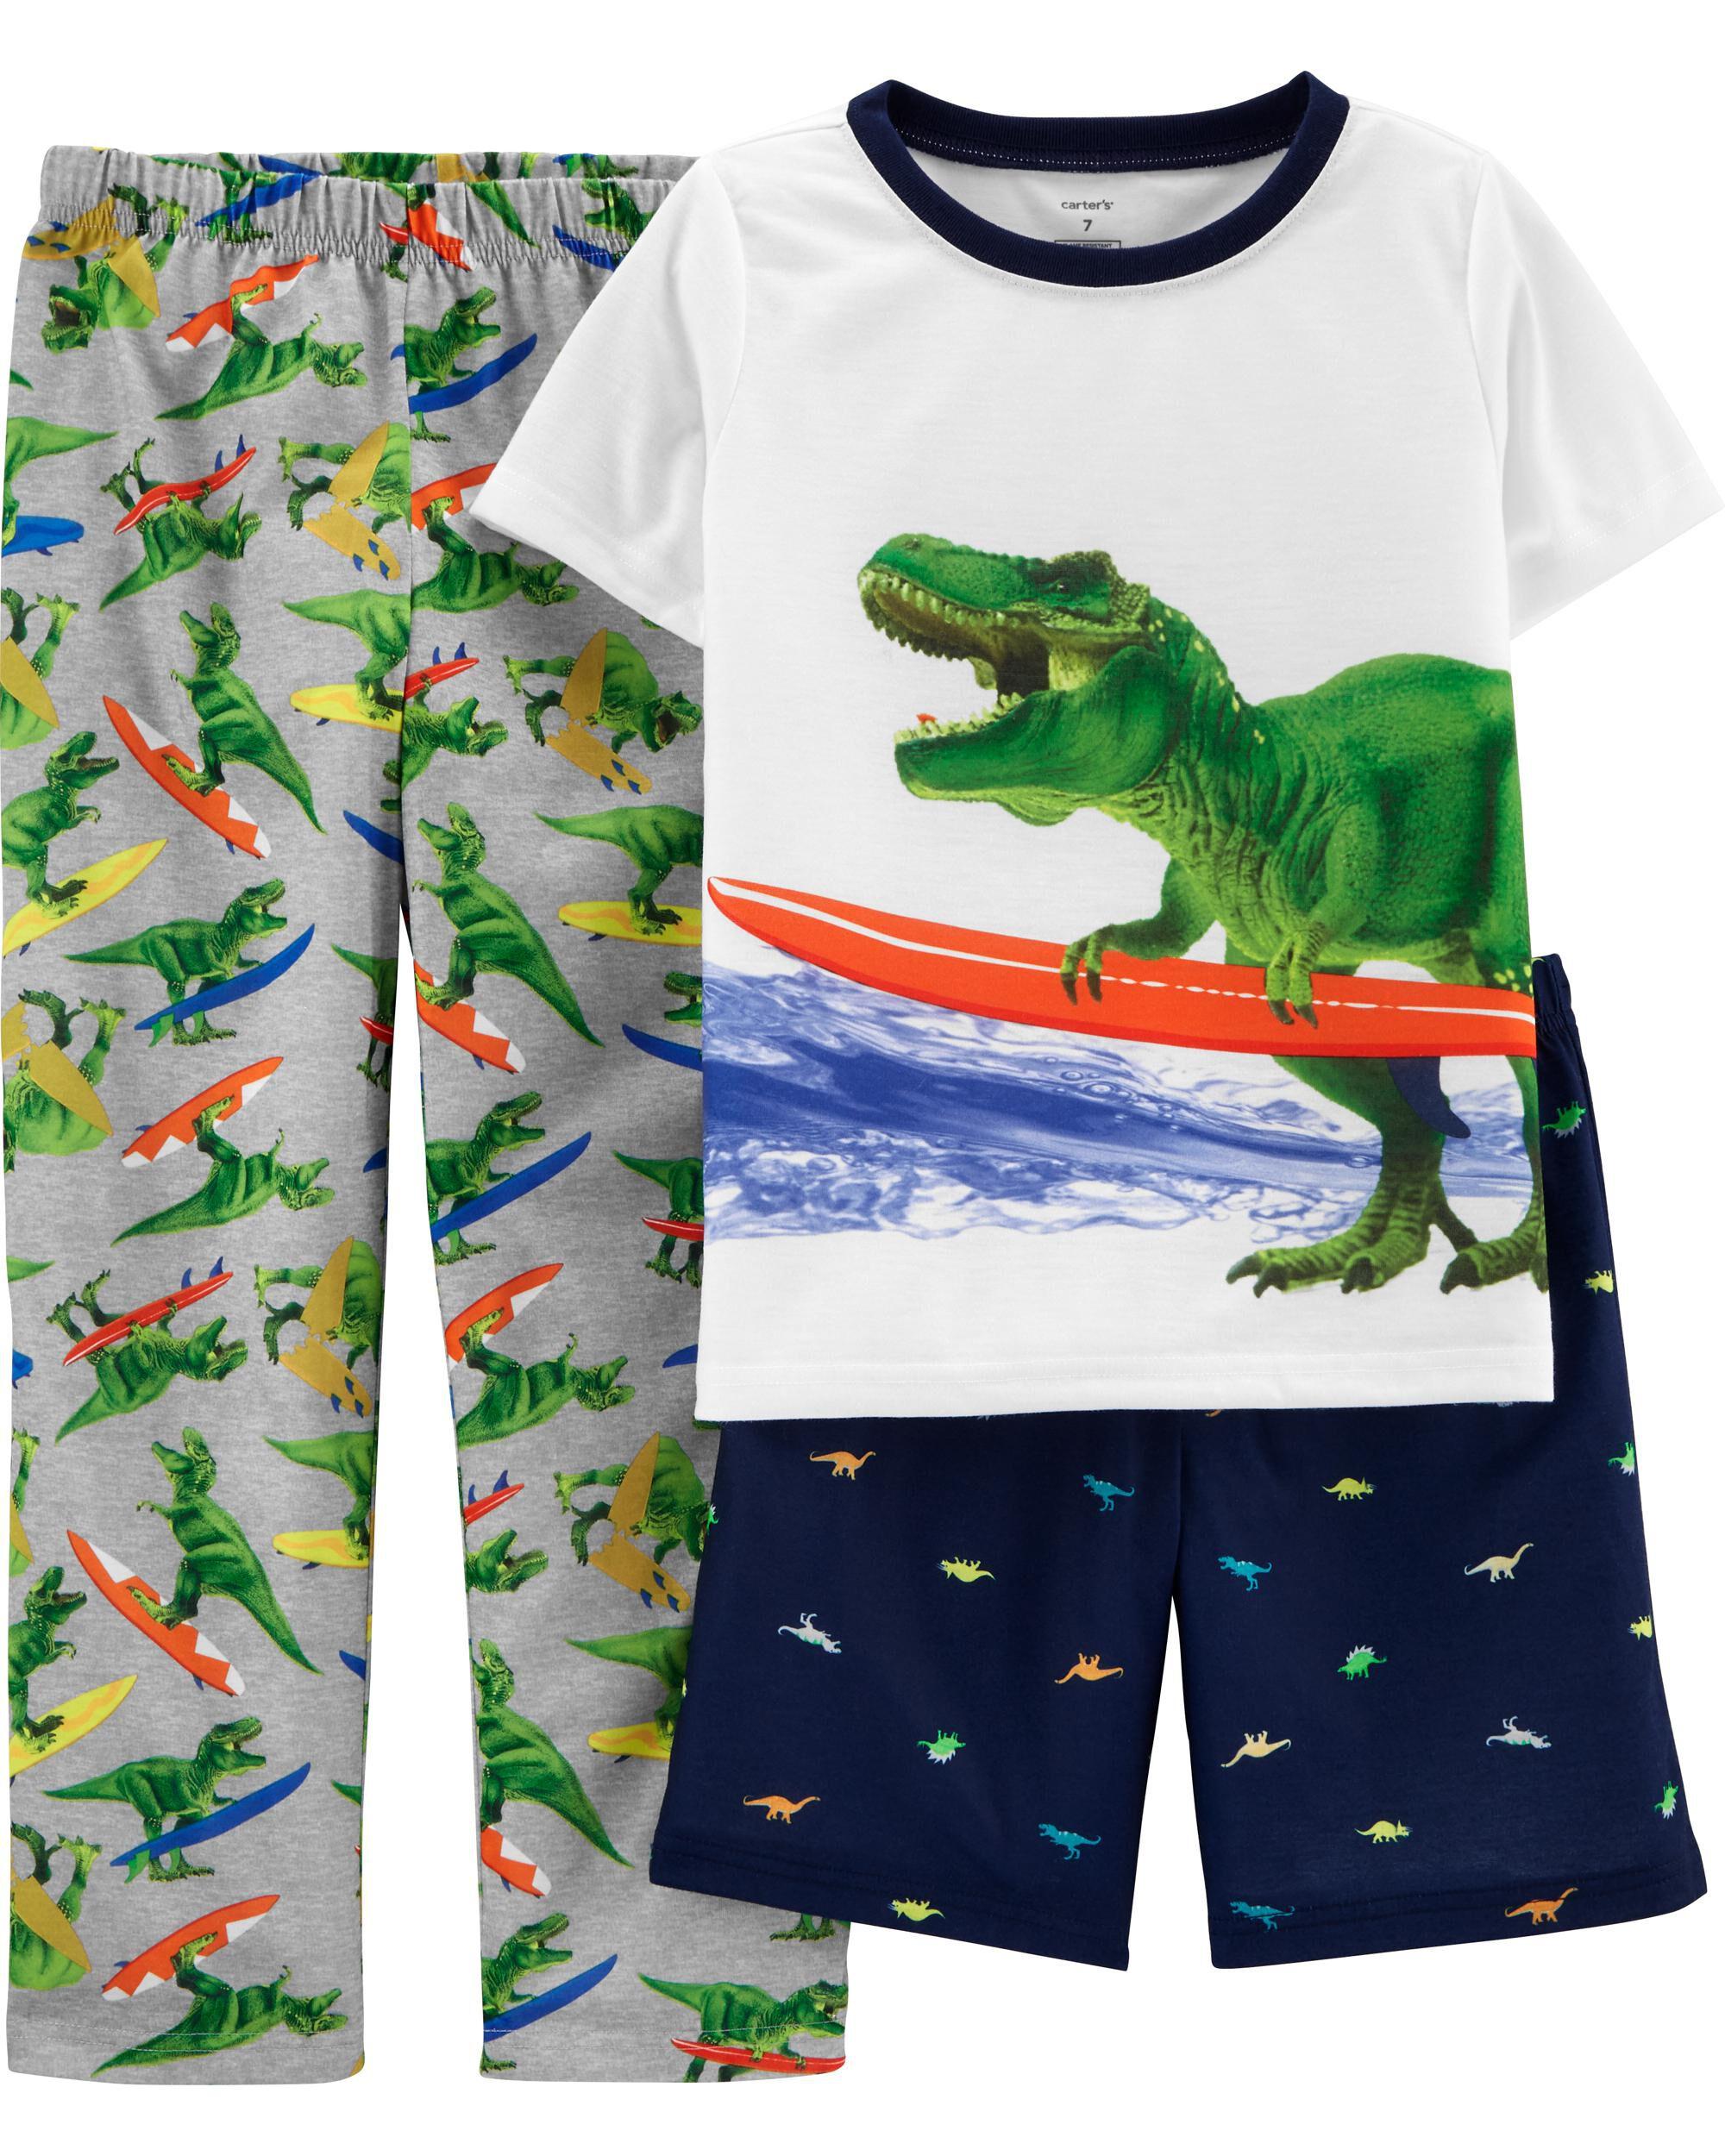 Boys Kids Official Character Pyjamas PJs Set Nightwear Age Size 4-12 Yrs